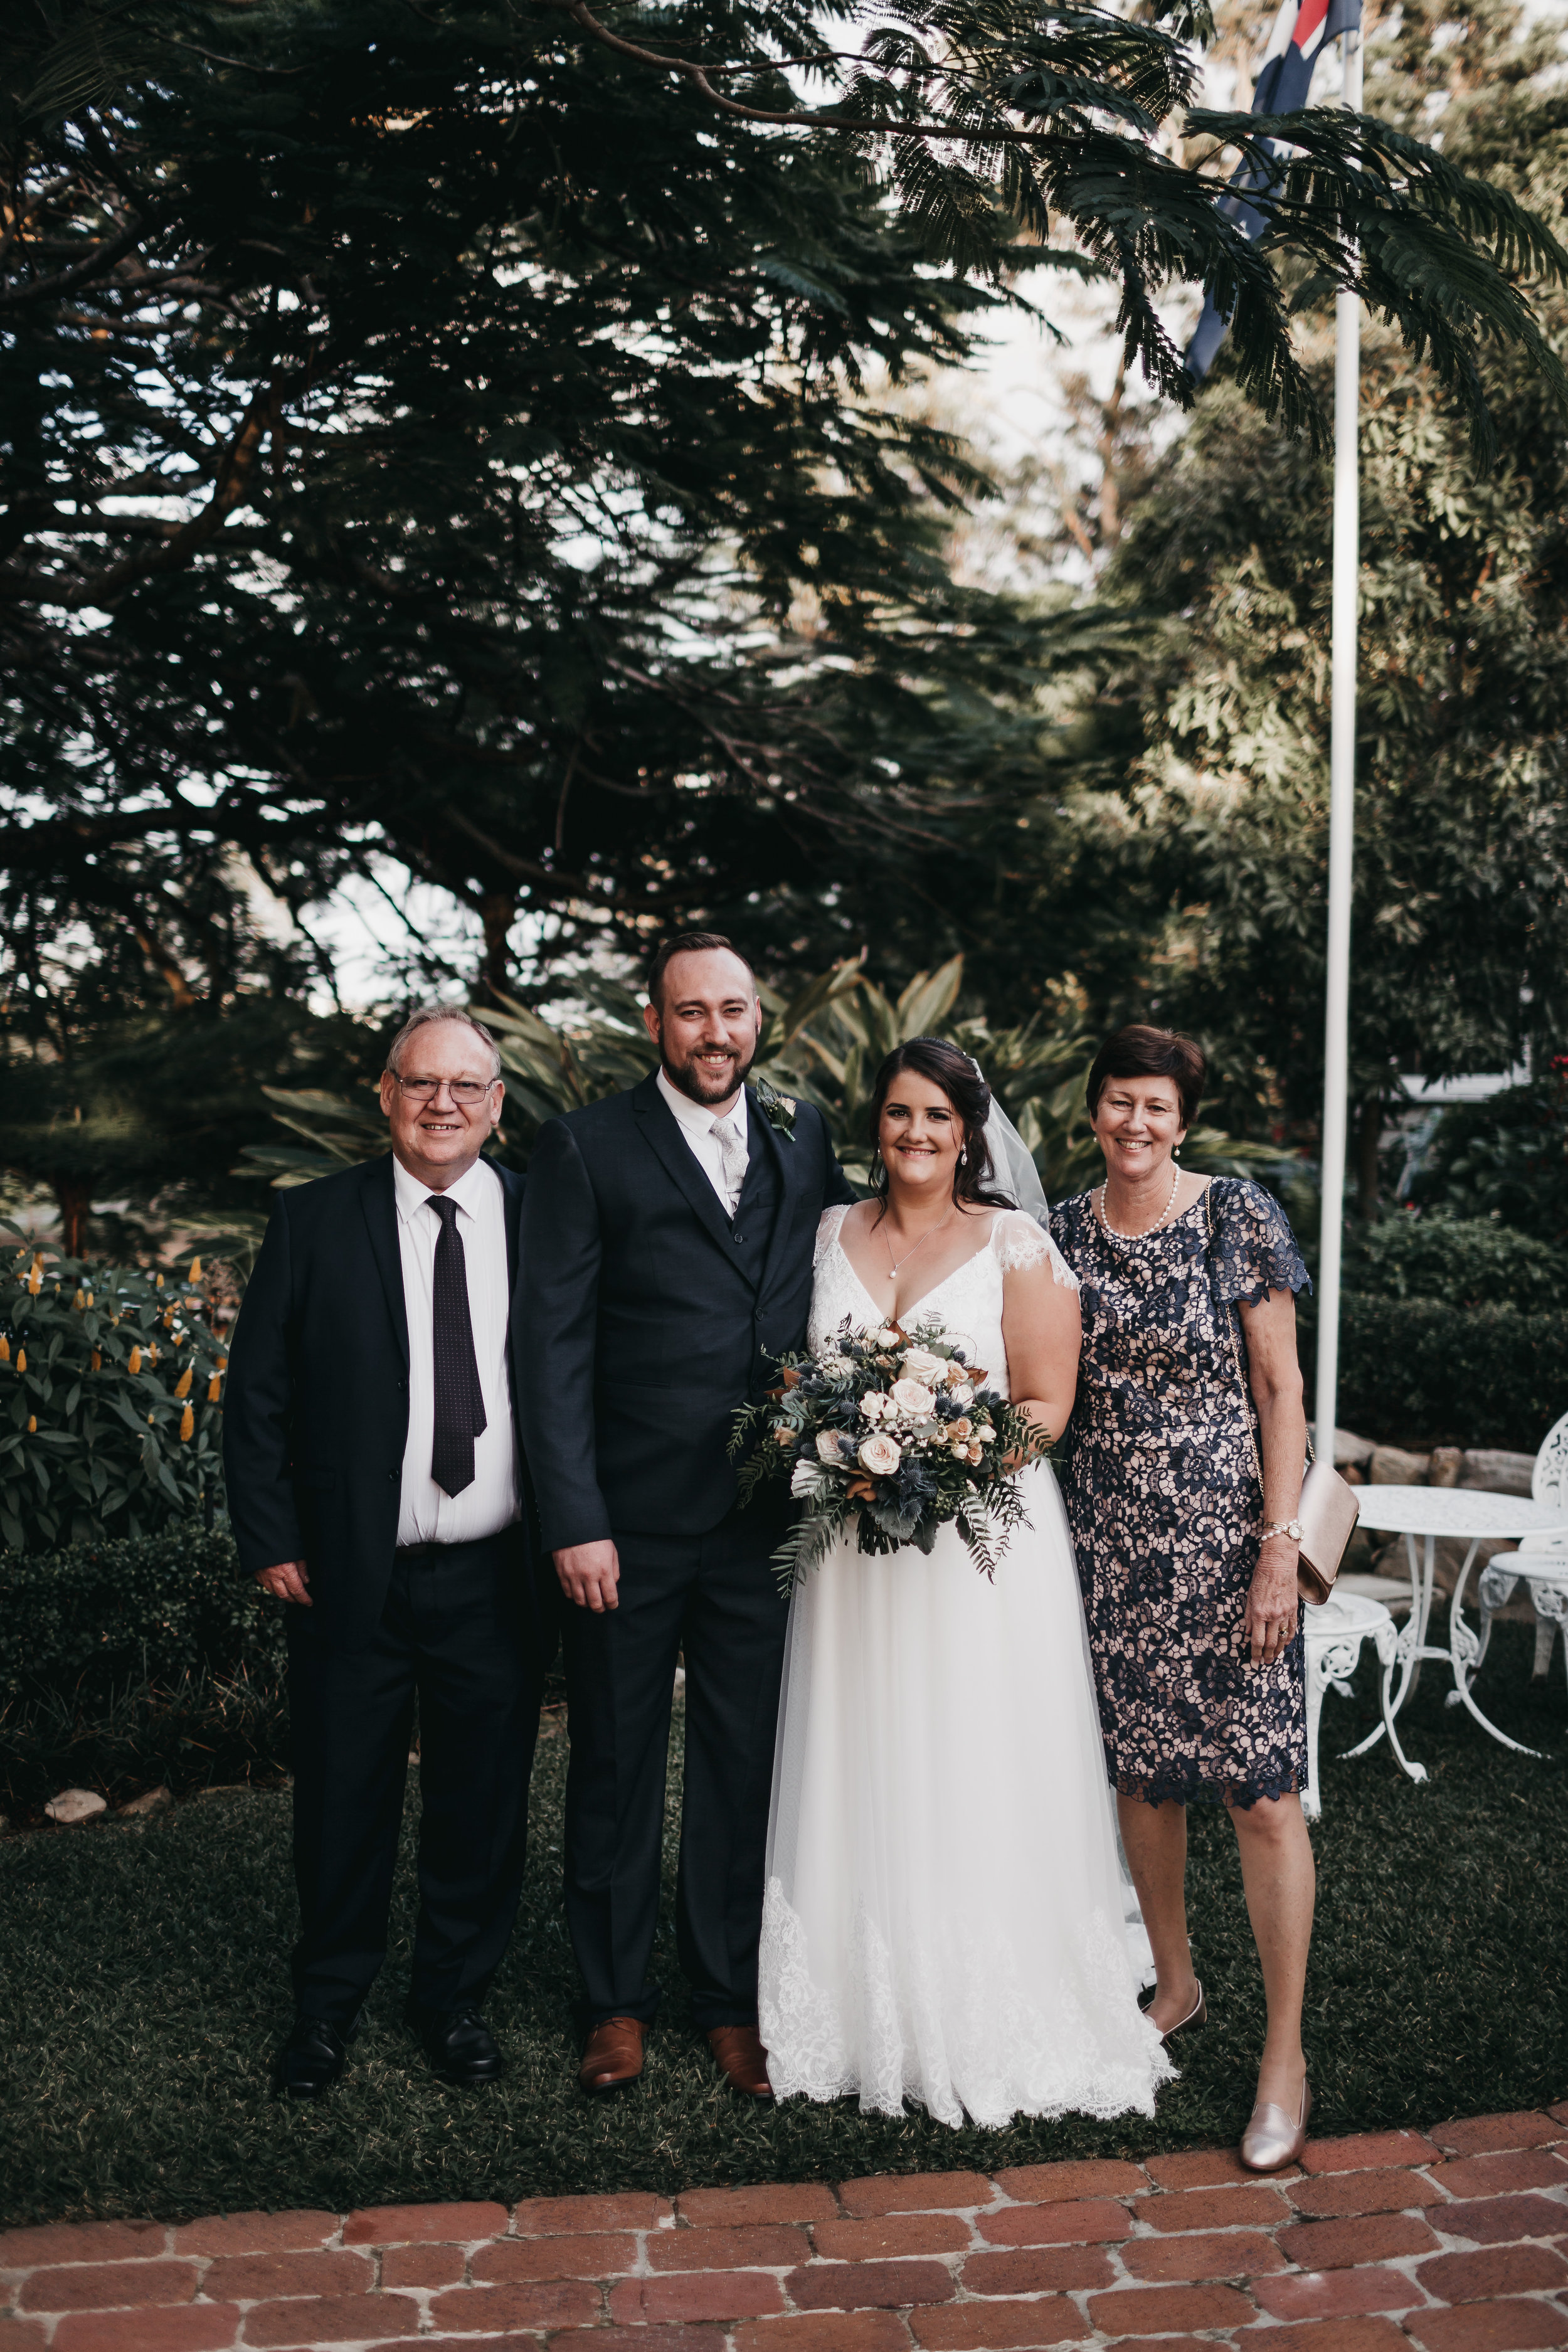 bondwedding-454.jpg